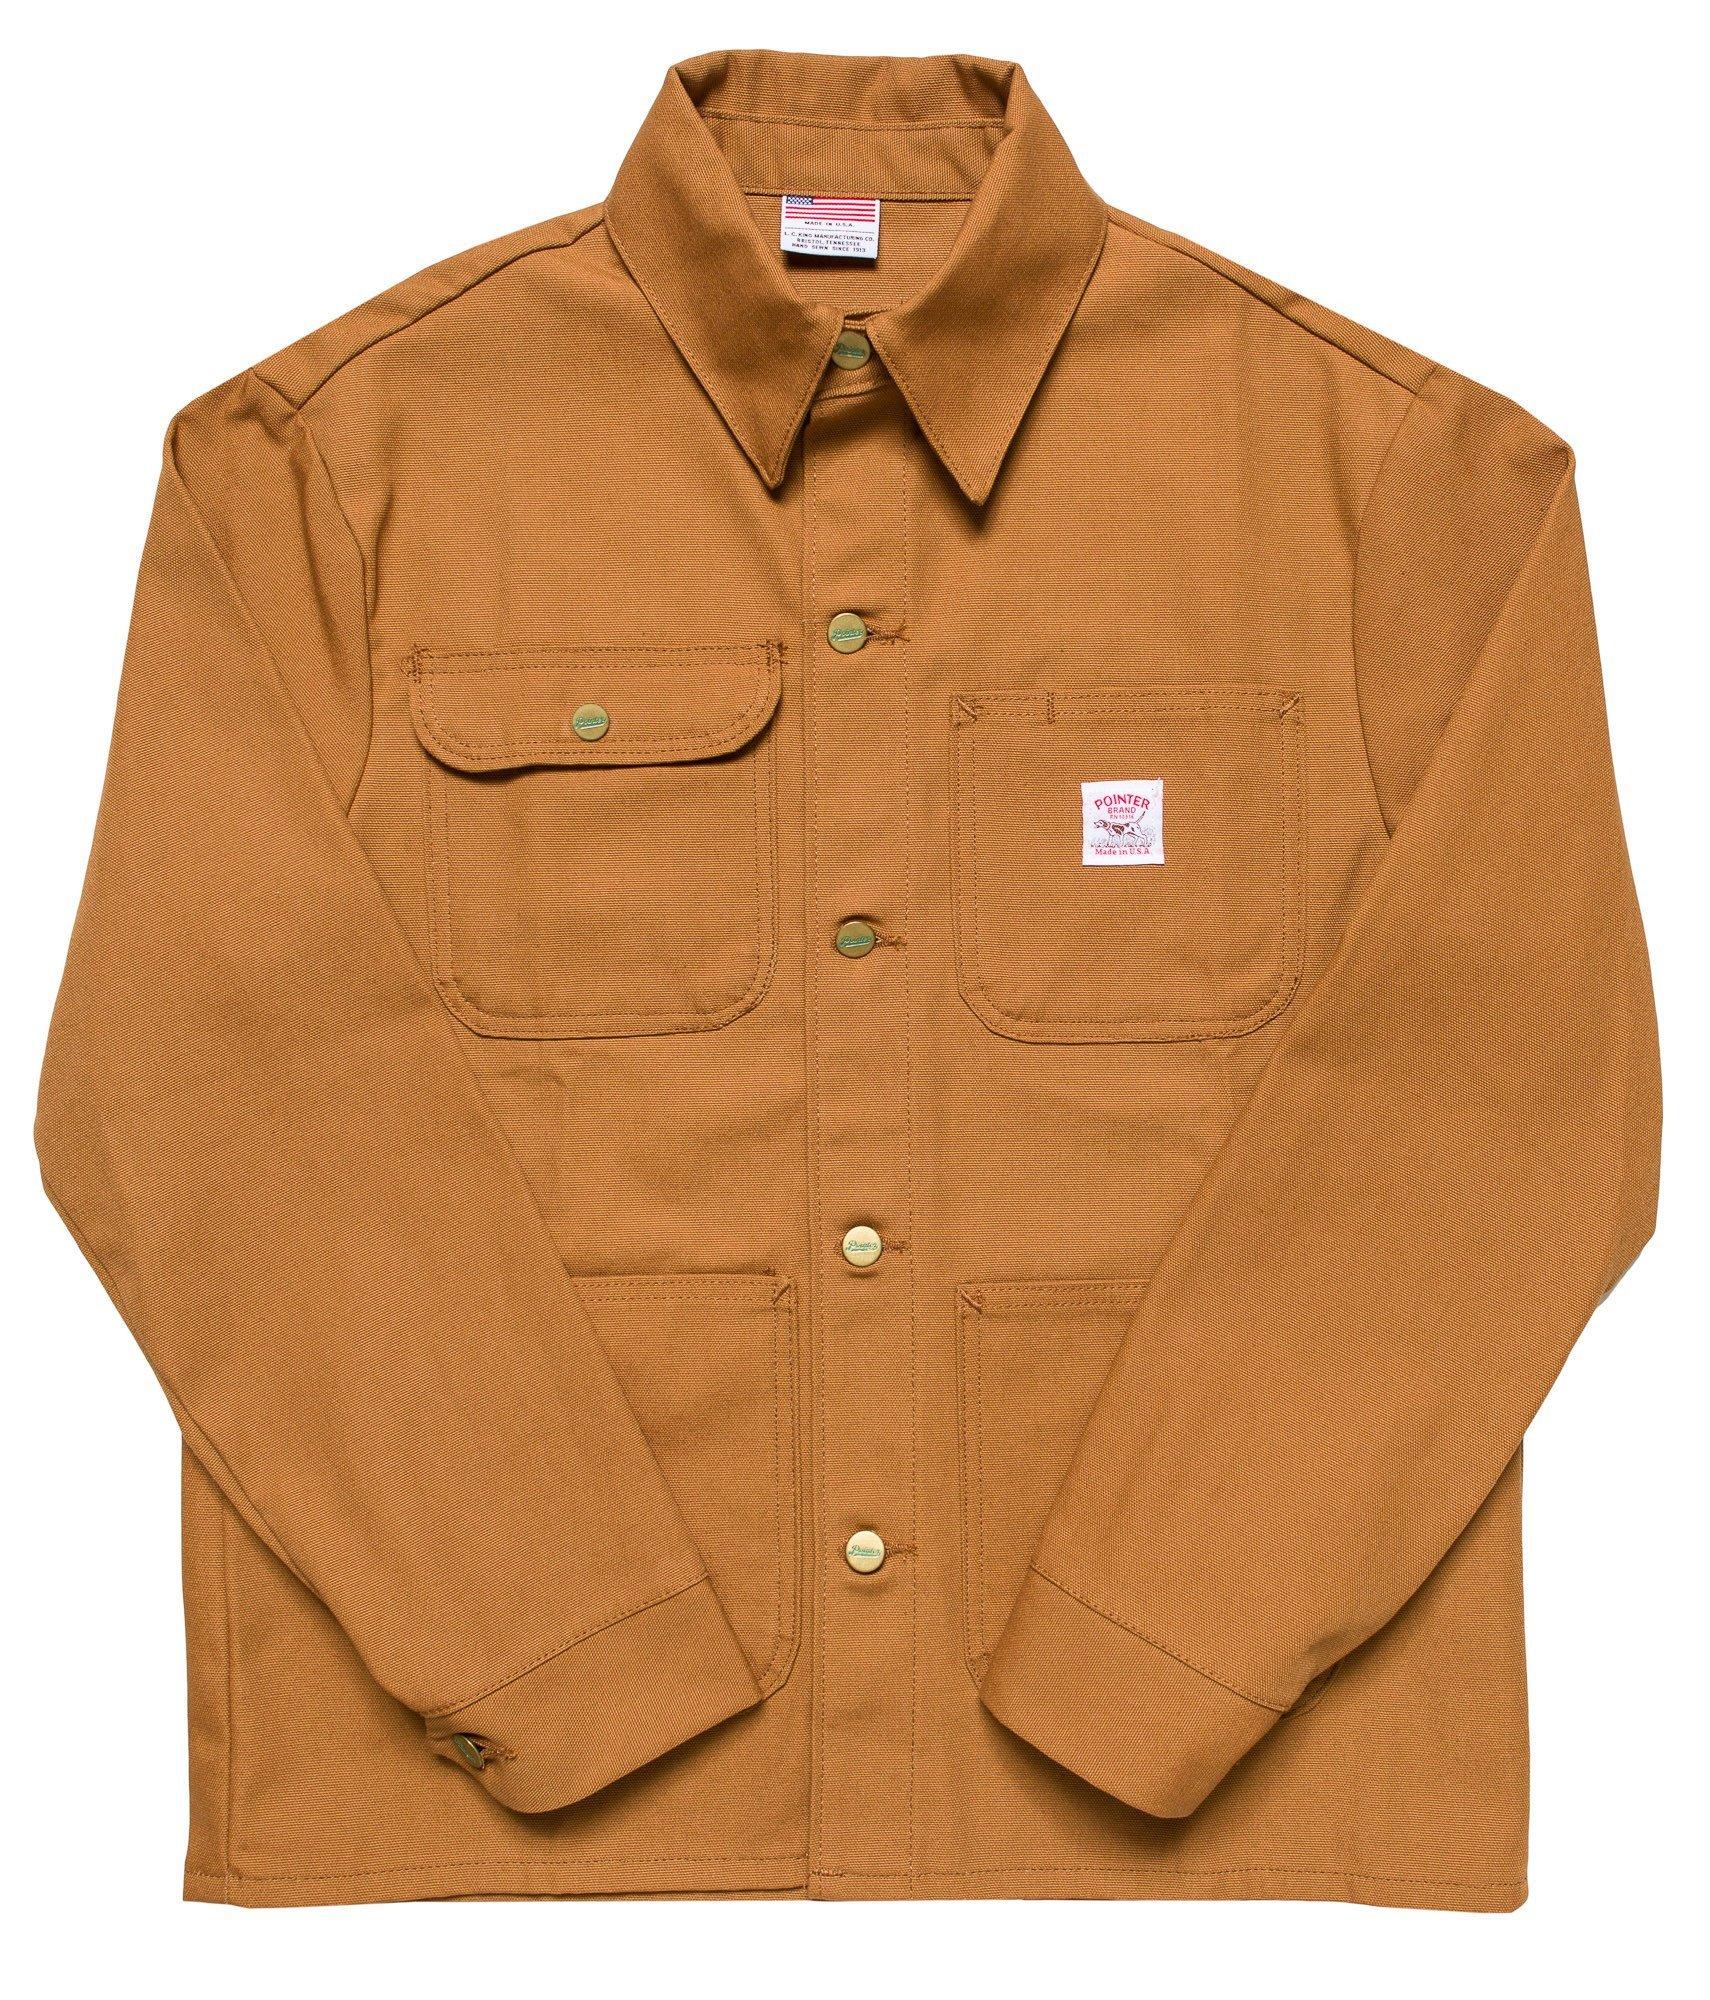 Pointer Brand Brown Duck Chore Coat XS Brown